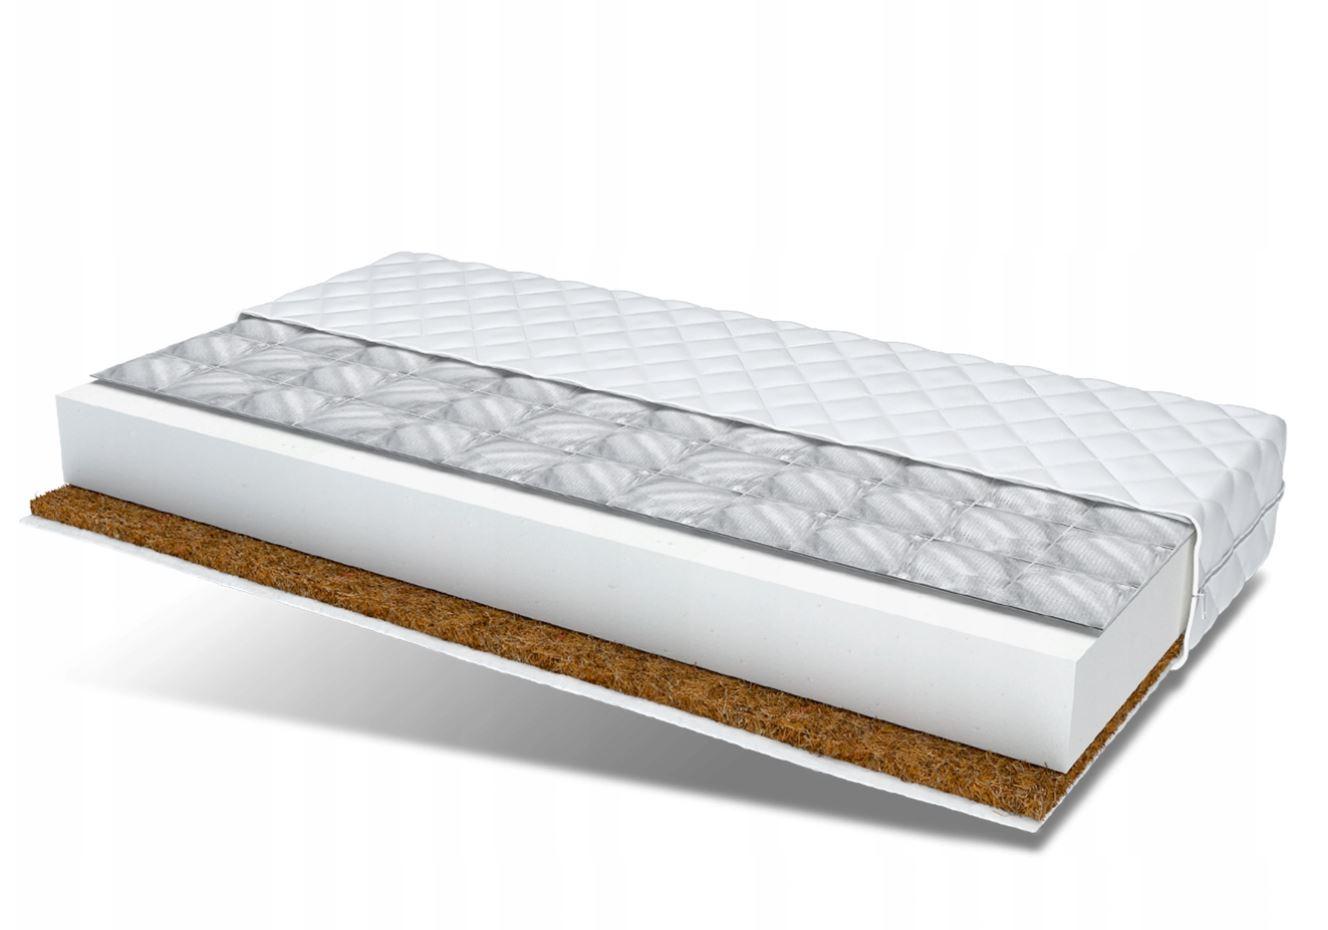 Dětská matrace Classic pohanka-kokos 120x60x9 cm